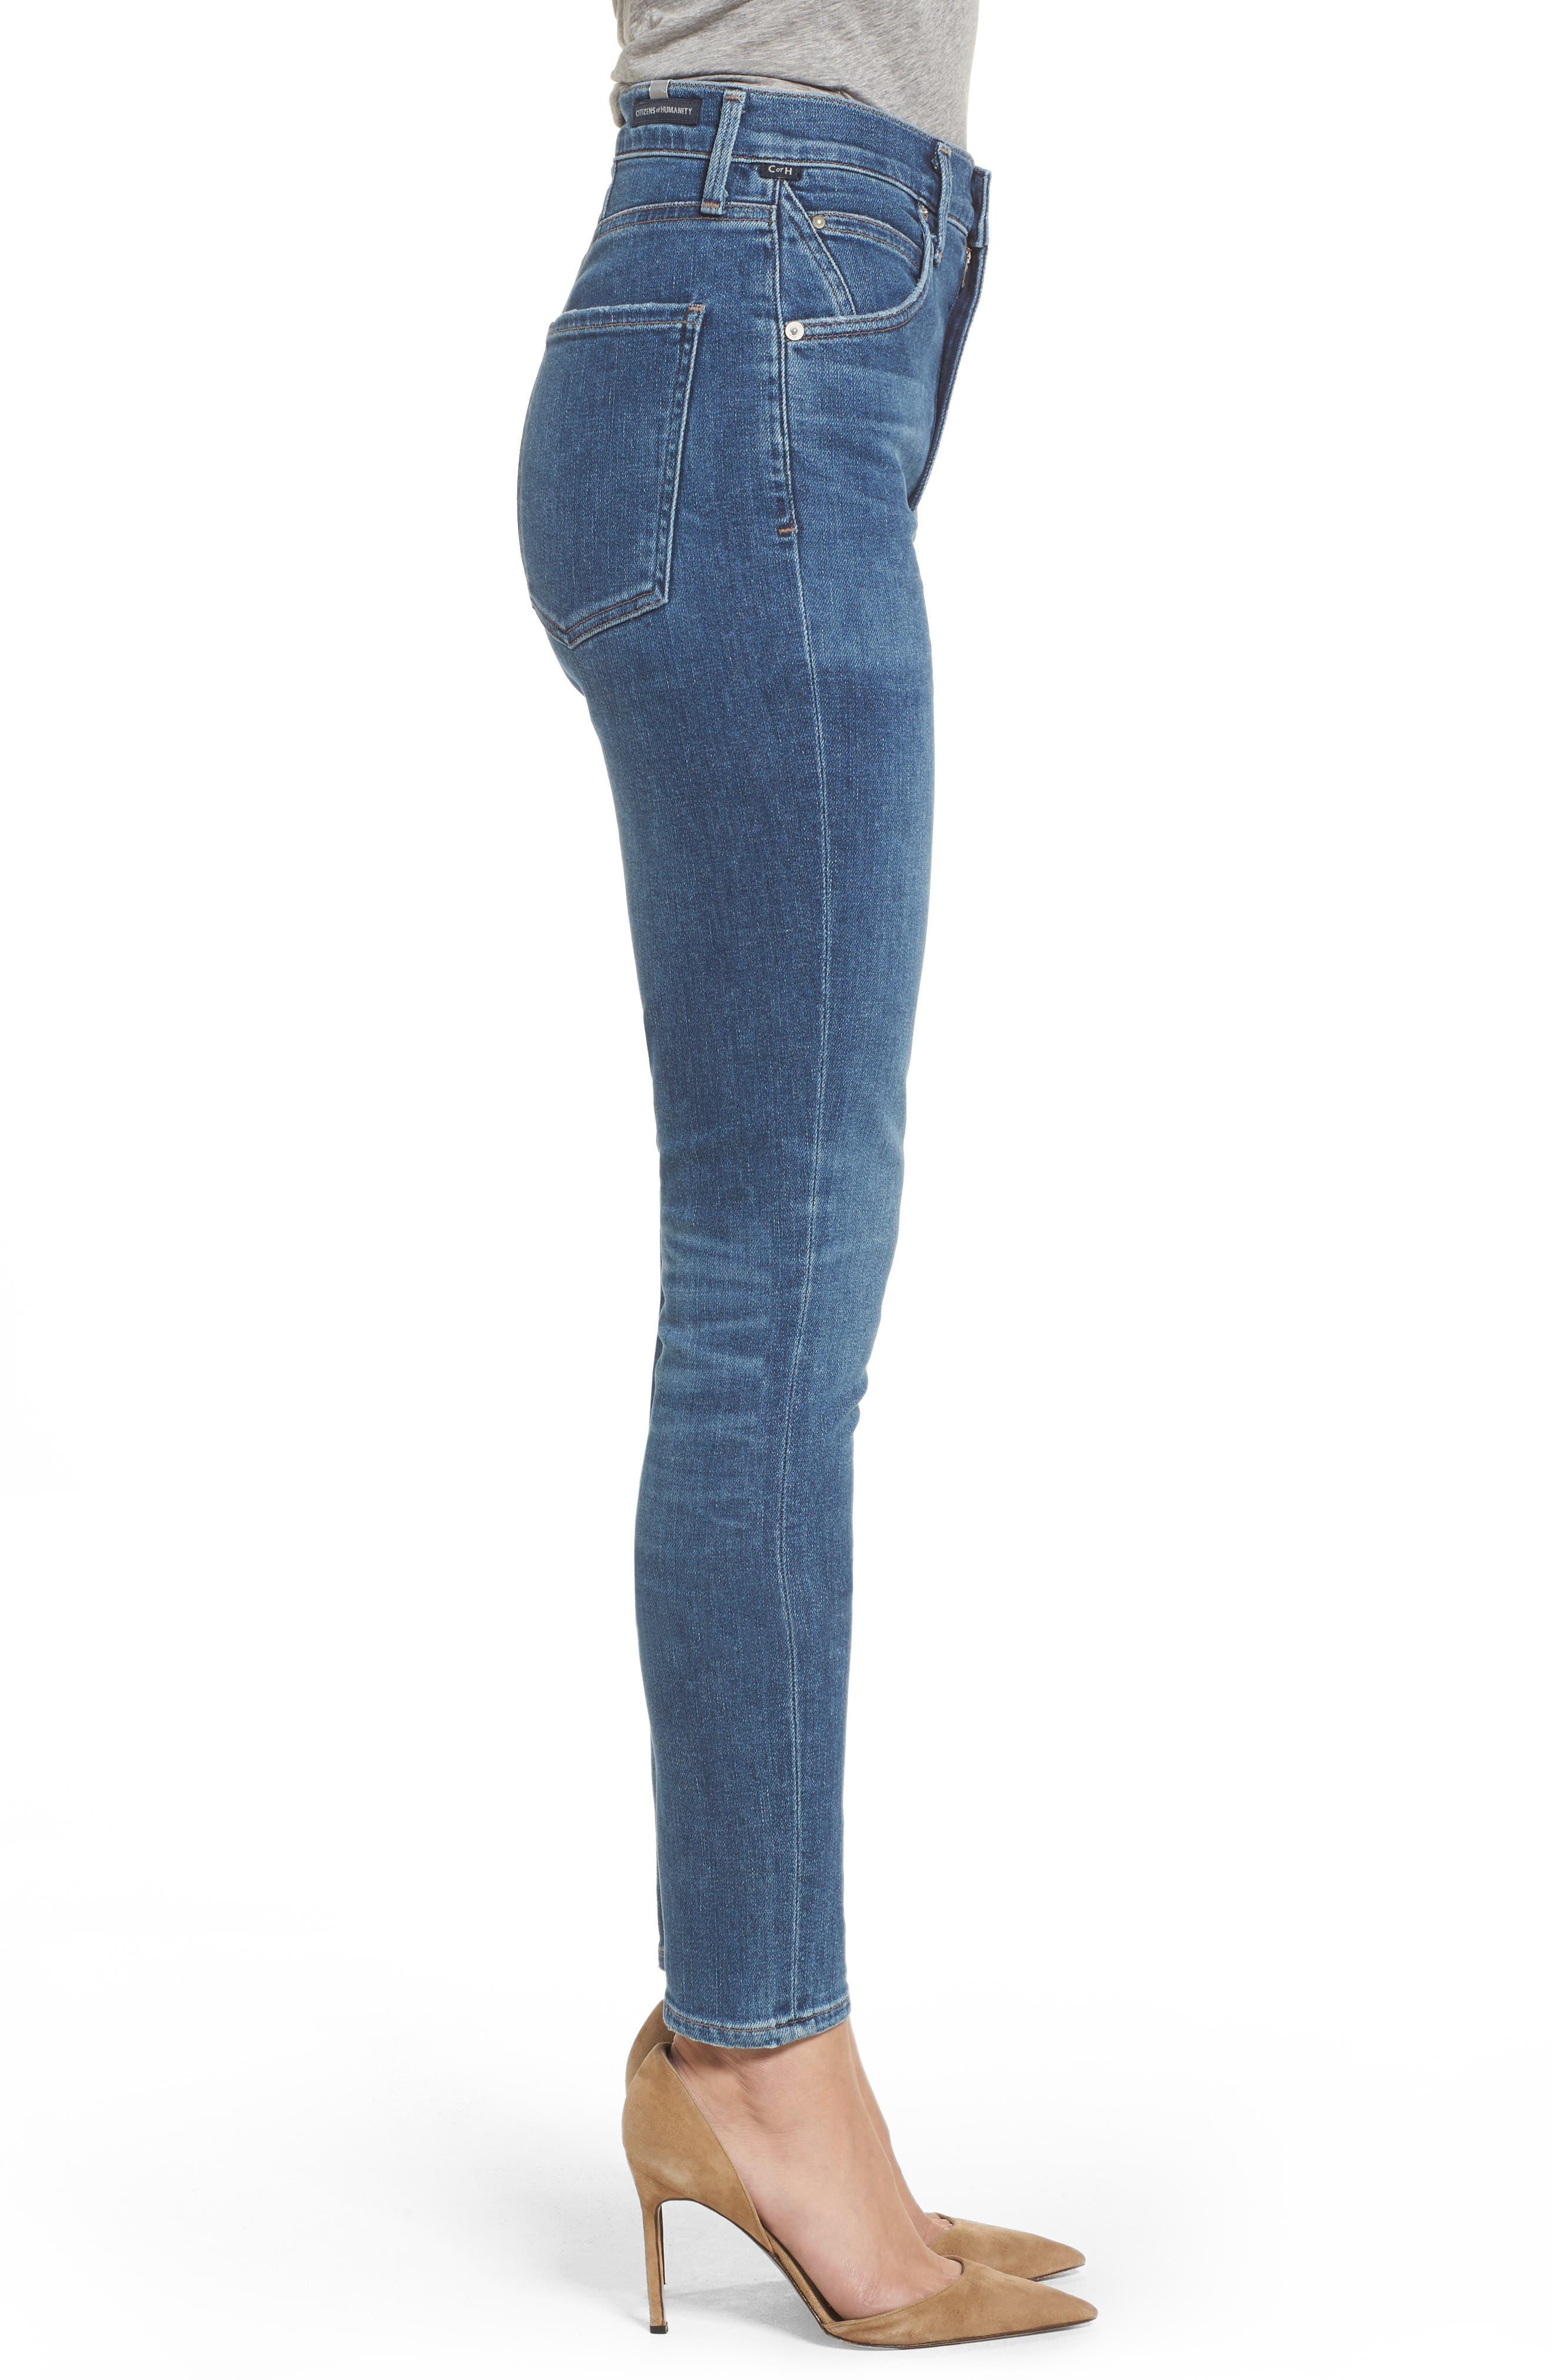 Chrissy High Waist Skinny Jeans,                             Alternate thumbnail 3, color,                             455